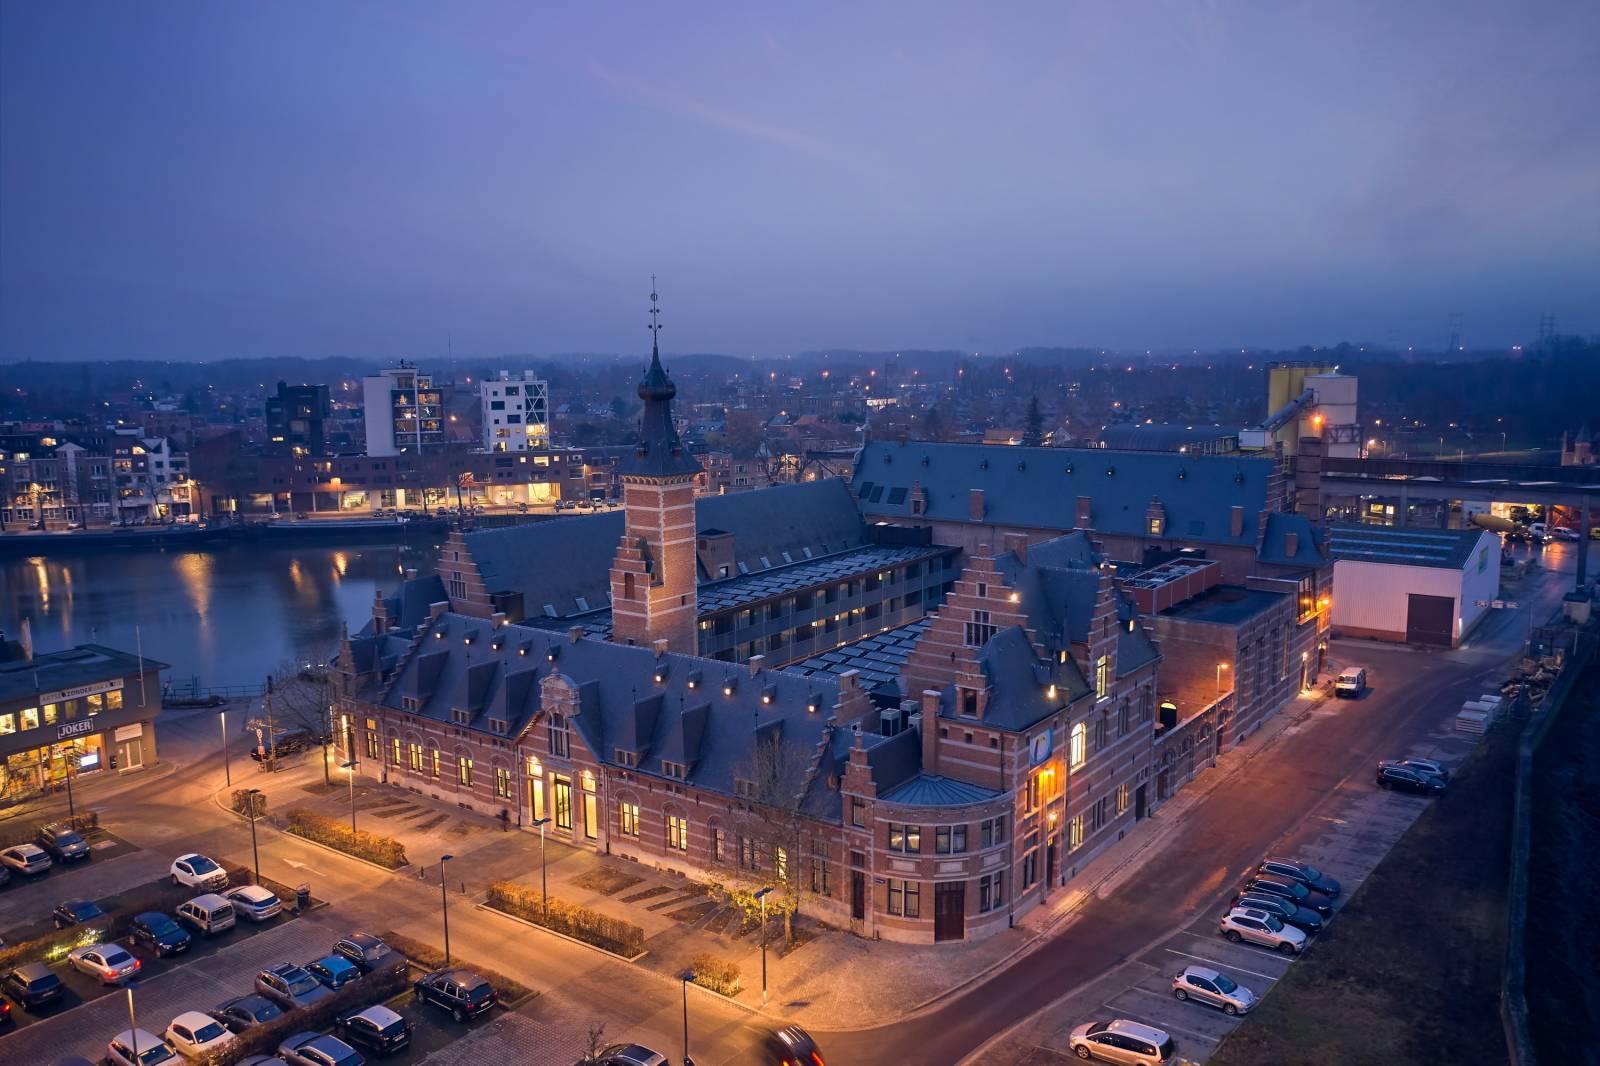 Feestal - Van der Valk hotel Mechelen - House of Weddings (13)